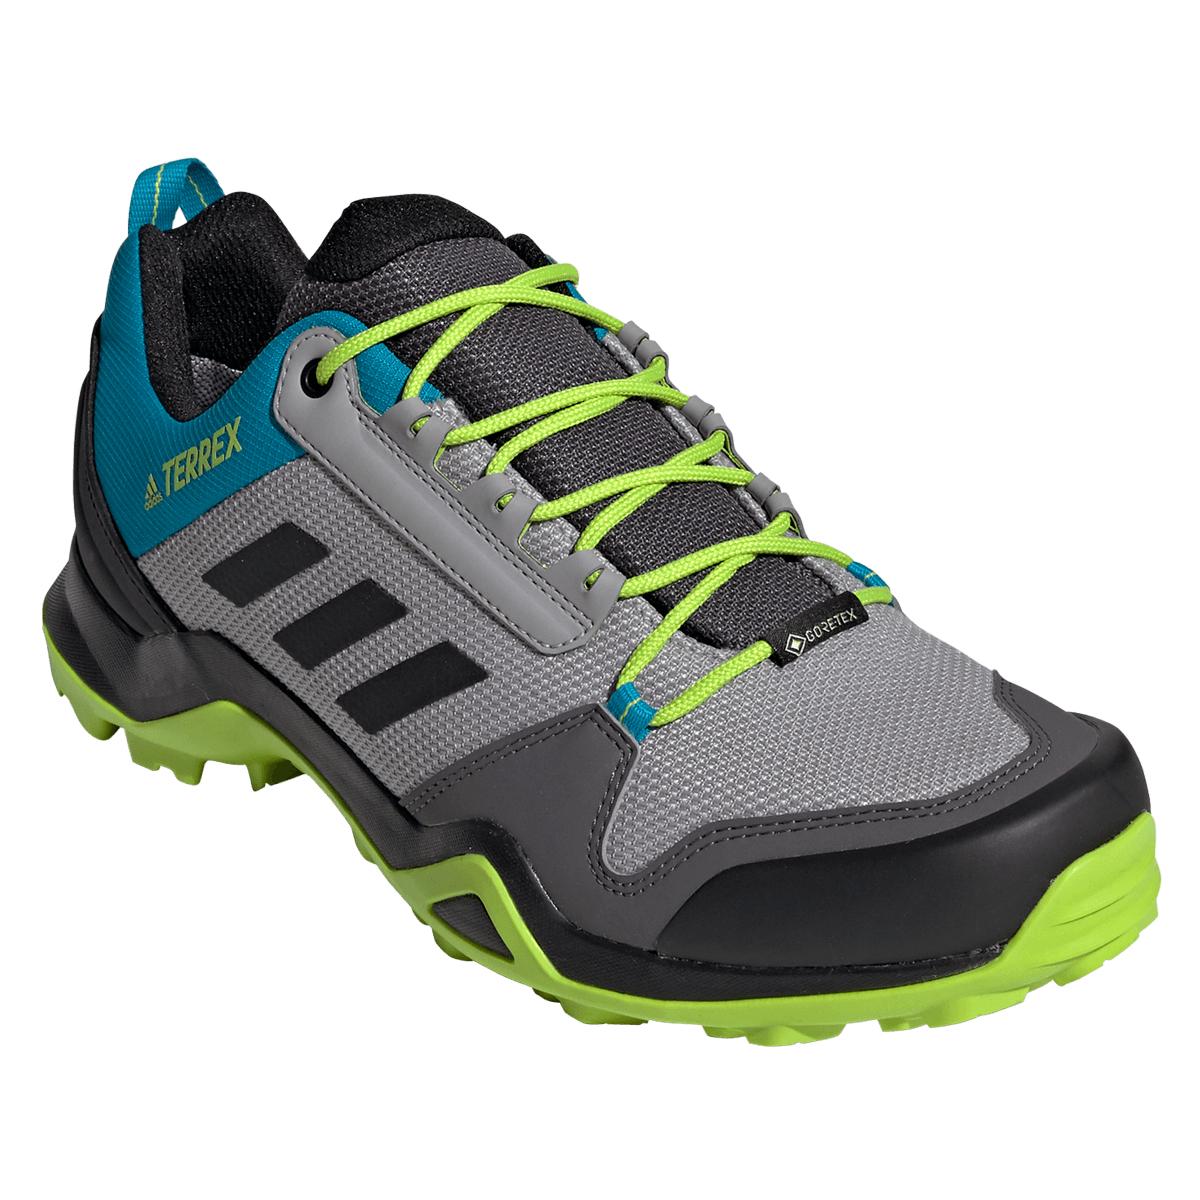 Schuhe bei z Terrex GTX Geomix adidas Badidas Terrex Schuh F1lKJ3Tc